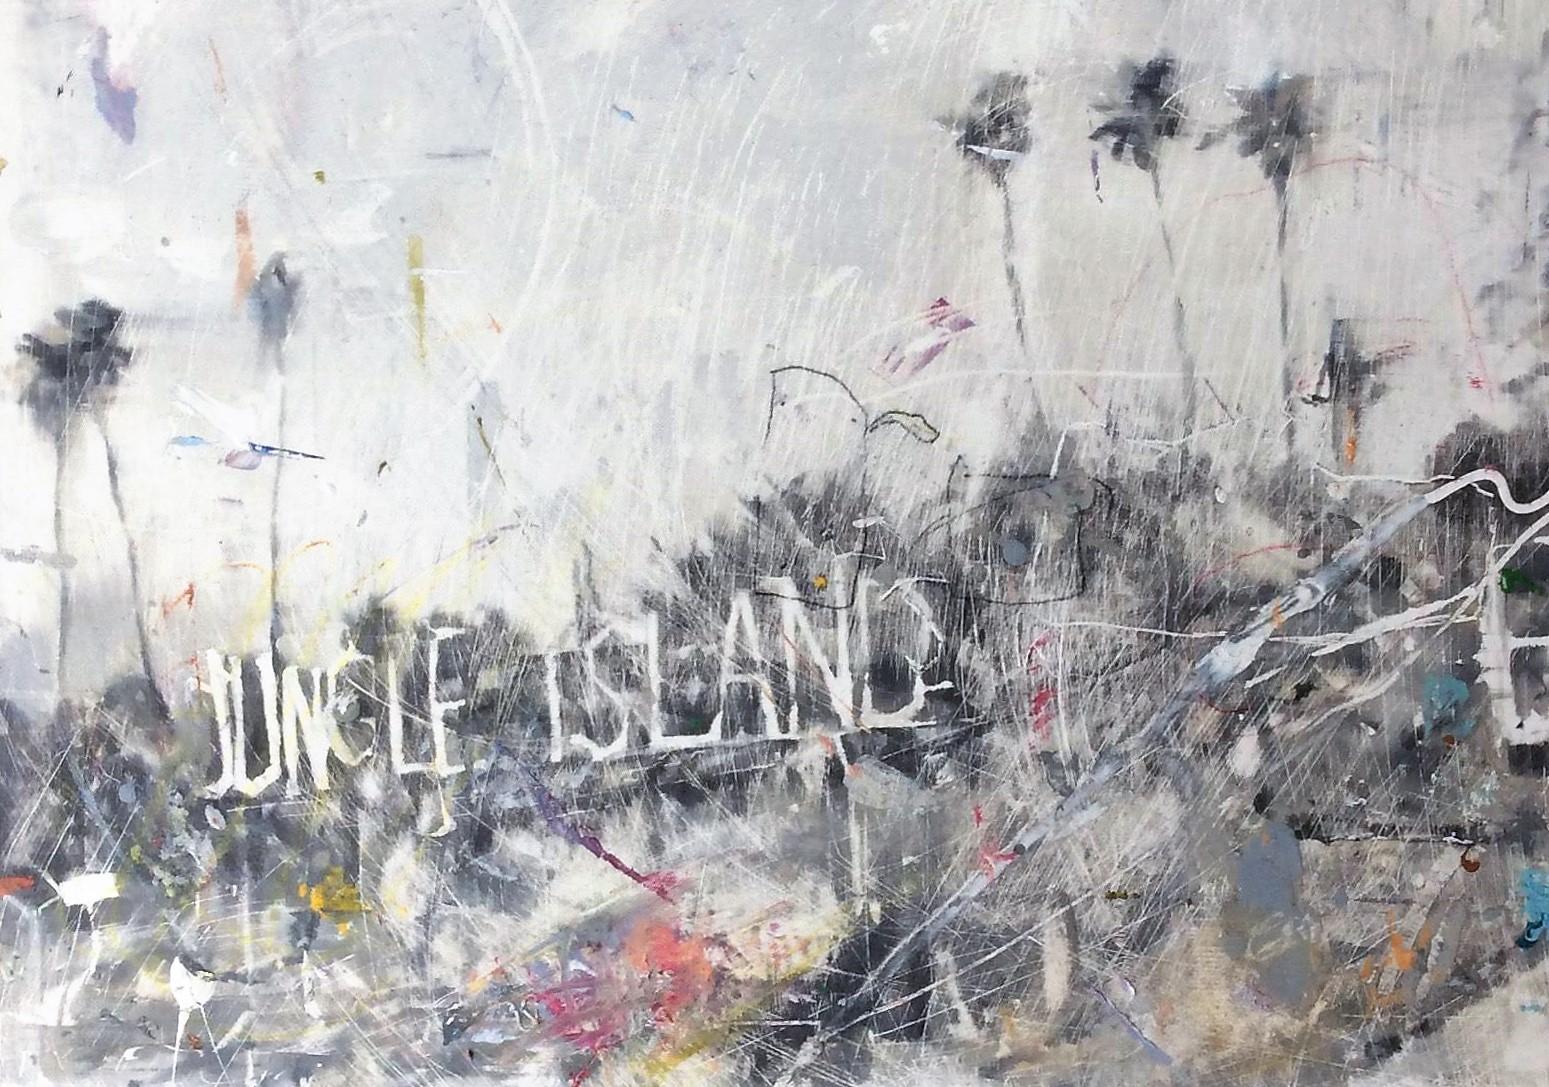 Jungle Island. Angela Bell. Jackson's Painting Prize.